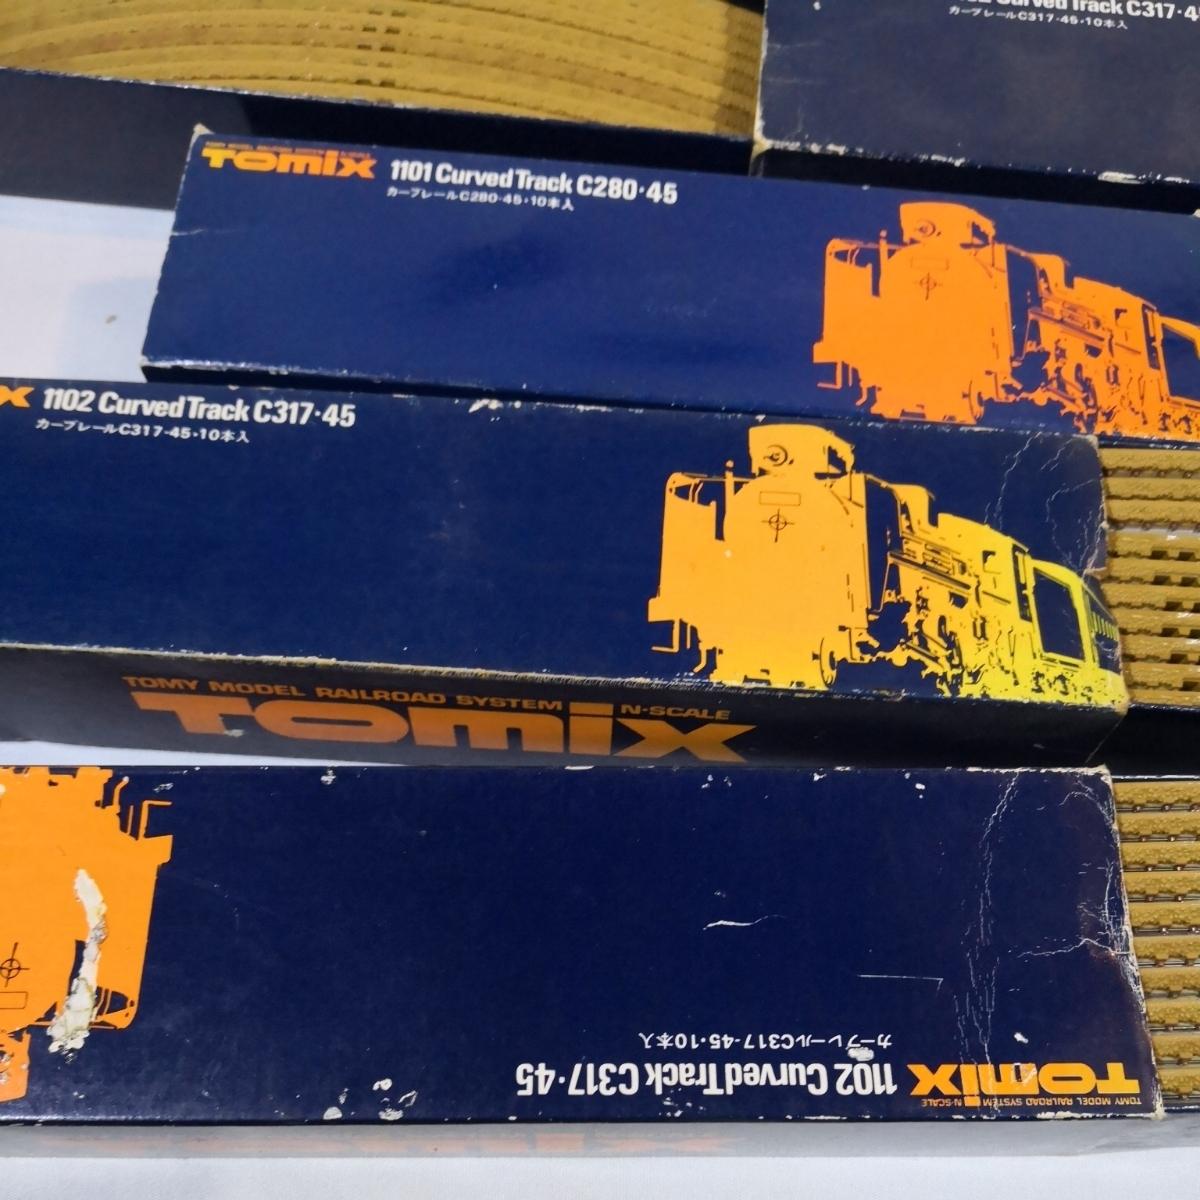 Nゲージ 鉄道模型用 レール ポイント切り替え部品 陸橋 など ジオラマ用部品 大量一括 TOMIX KATO _画像7